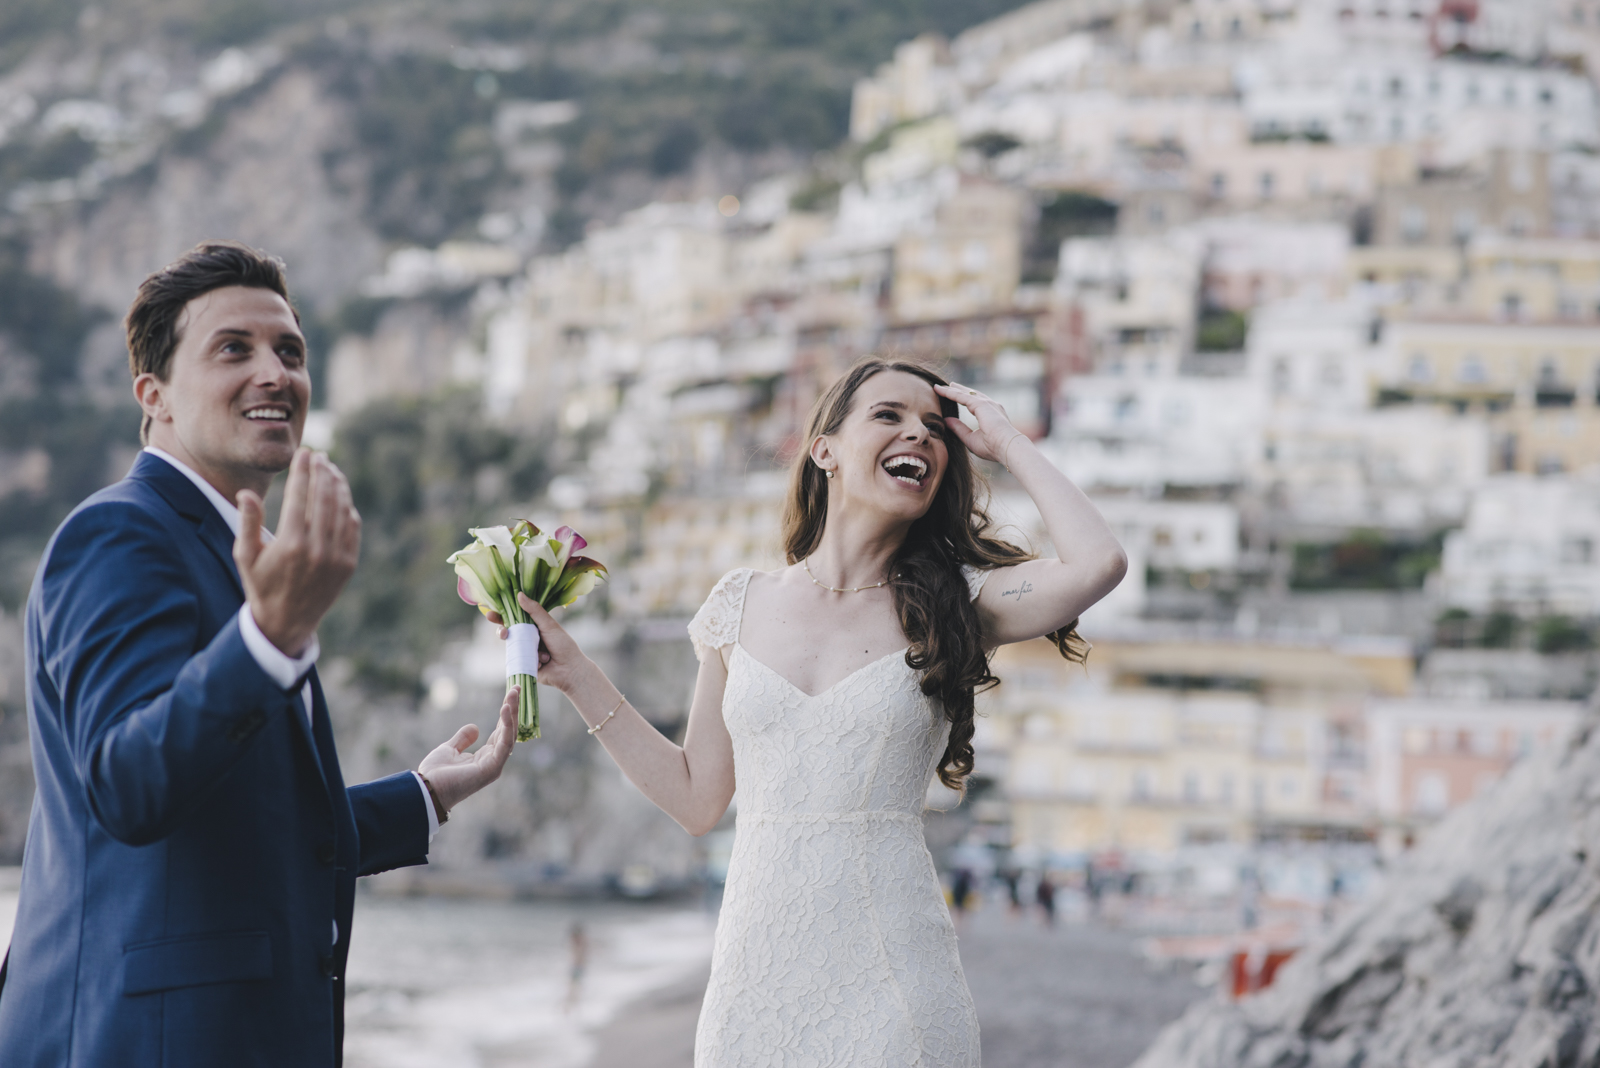 weddings in Positano - Positano wedding planner